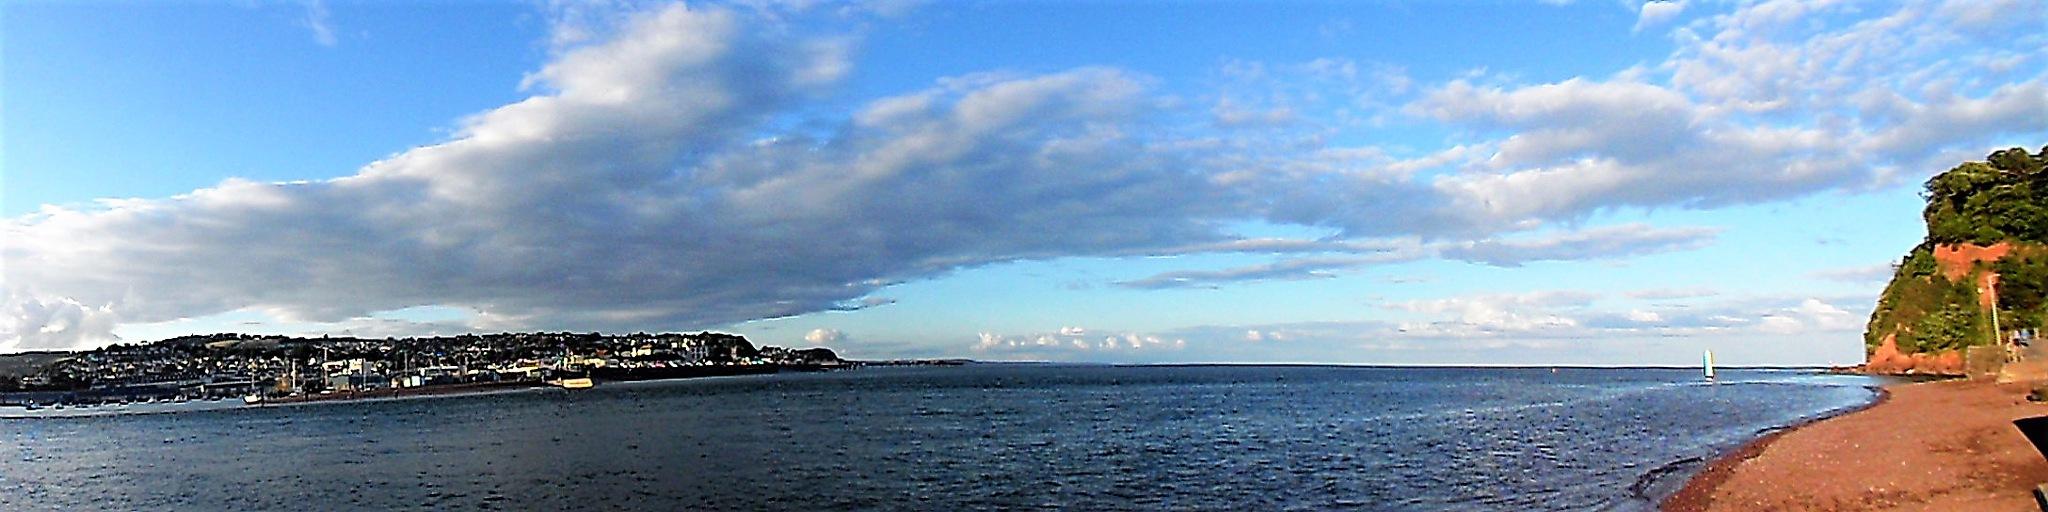 Panoramic view of Teign Estuary by Sandra Wright